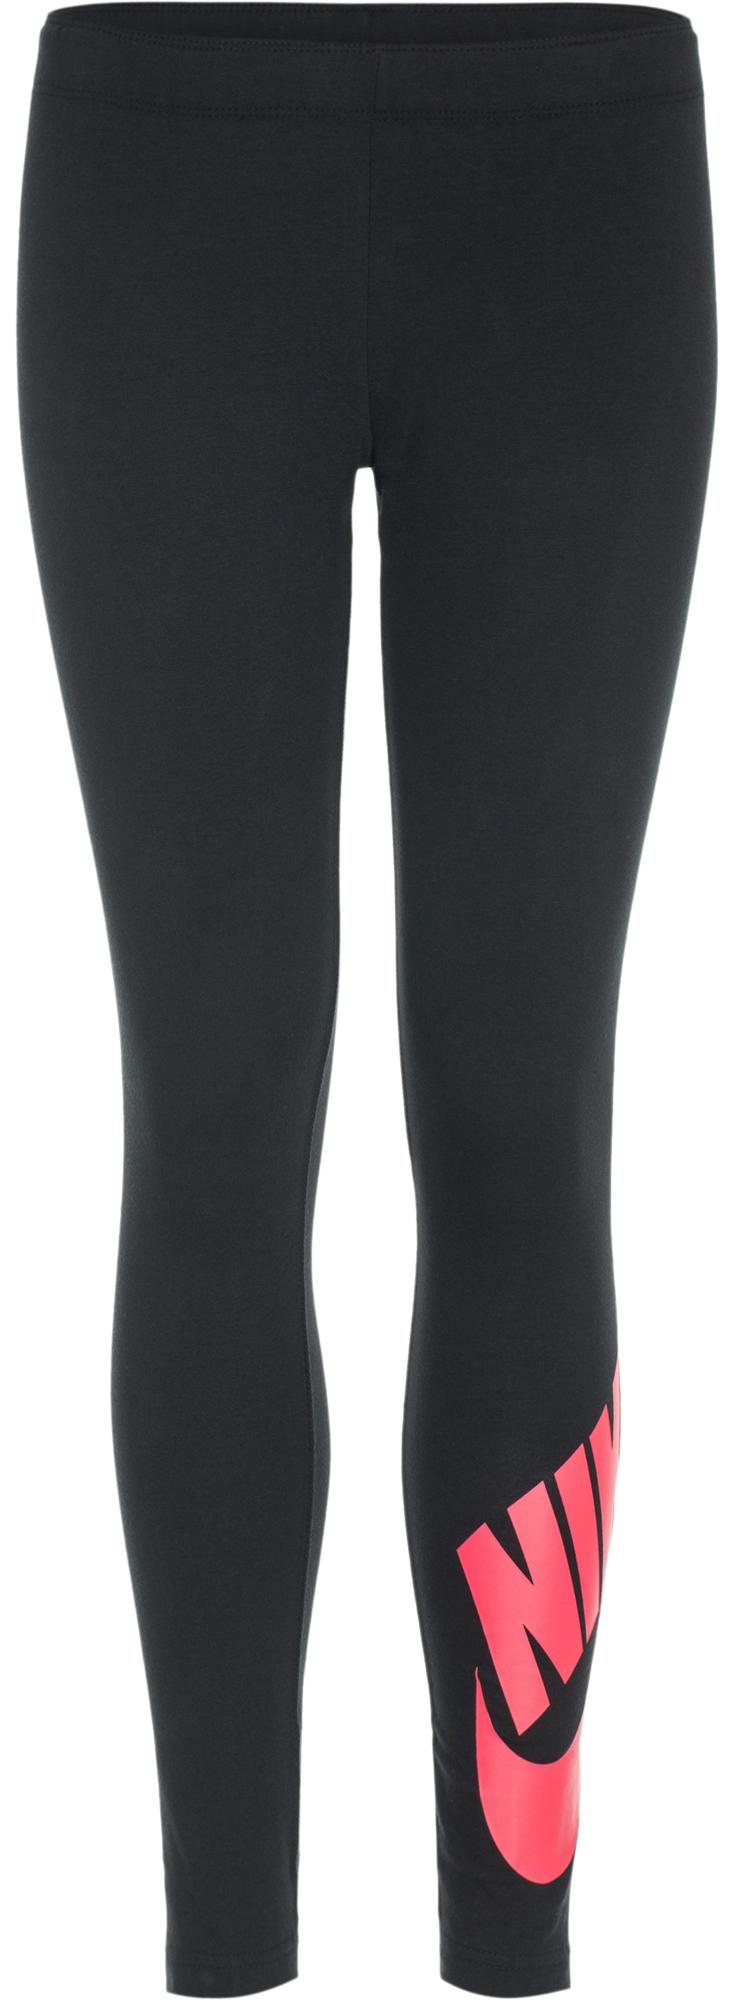 Nike Легинсы для девочек Nike Sportswear Leg-A-See